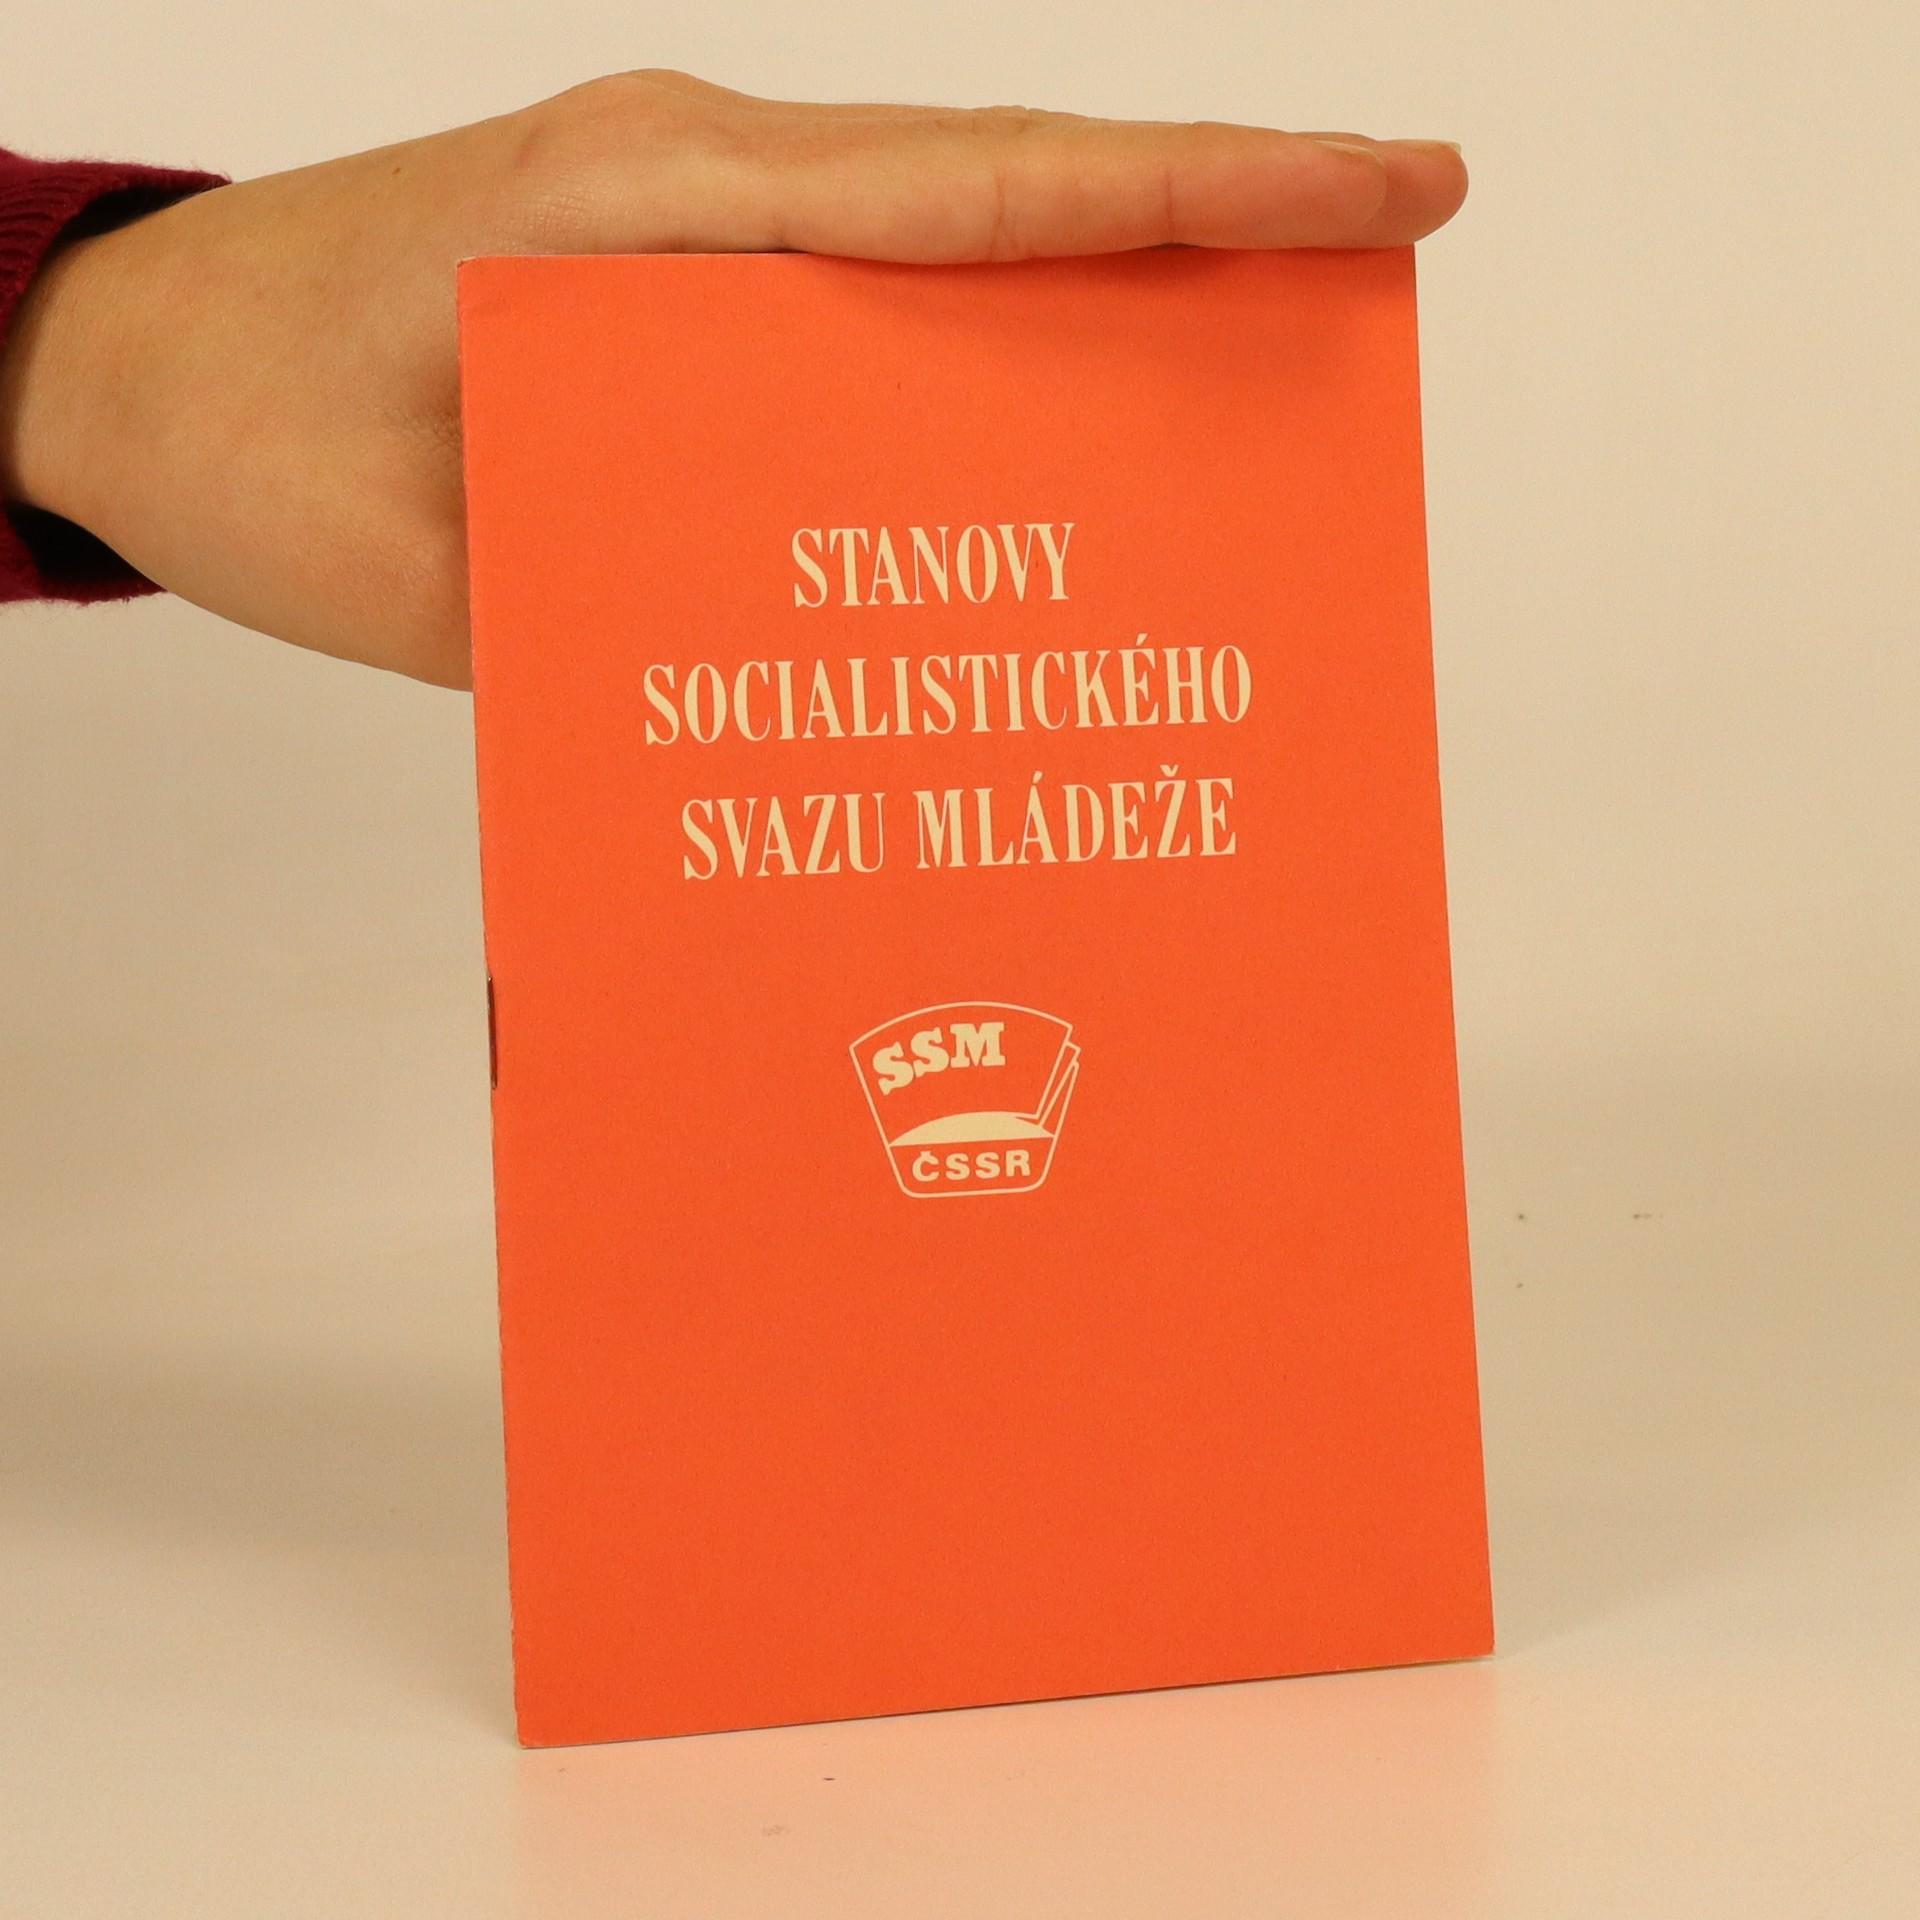 antikvární kniha Stanovy socialistického svazu mládeže, neuveden